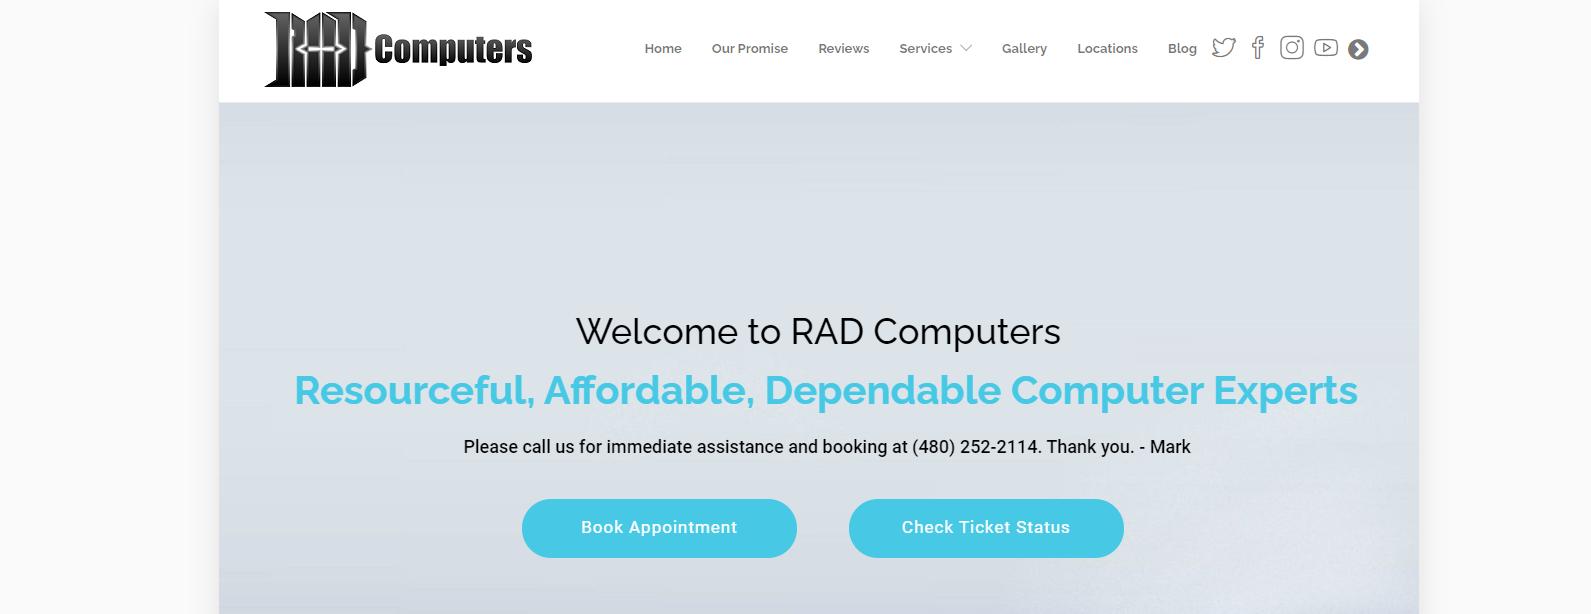 RAD Computers